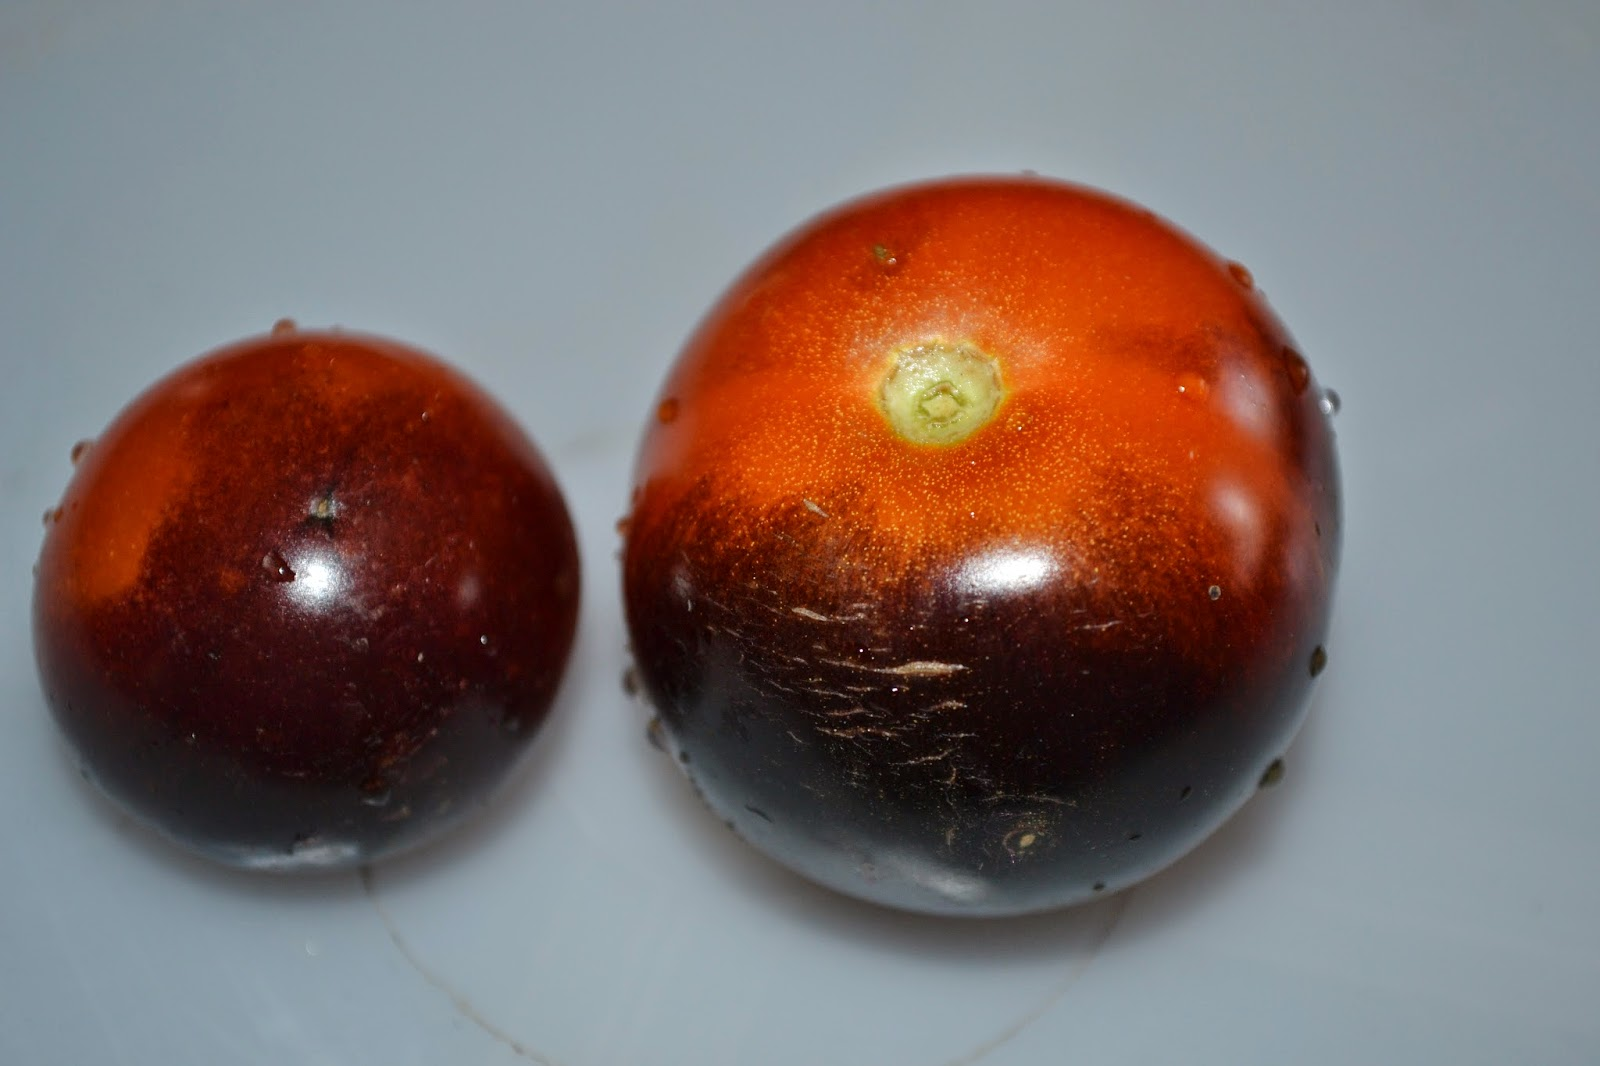 indigo rose schwarze blue rote tomatensorte tomaten bohnen pfirsich. Black Bedroom Furniture Sets. Home Design Ideas